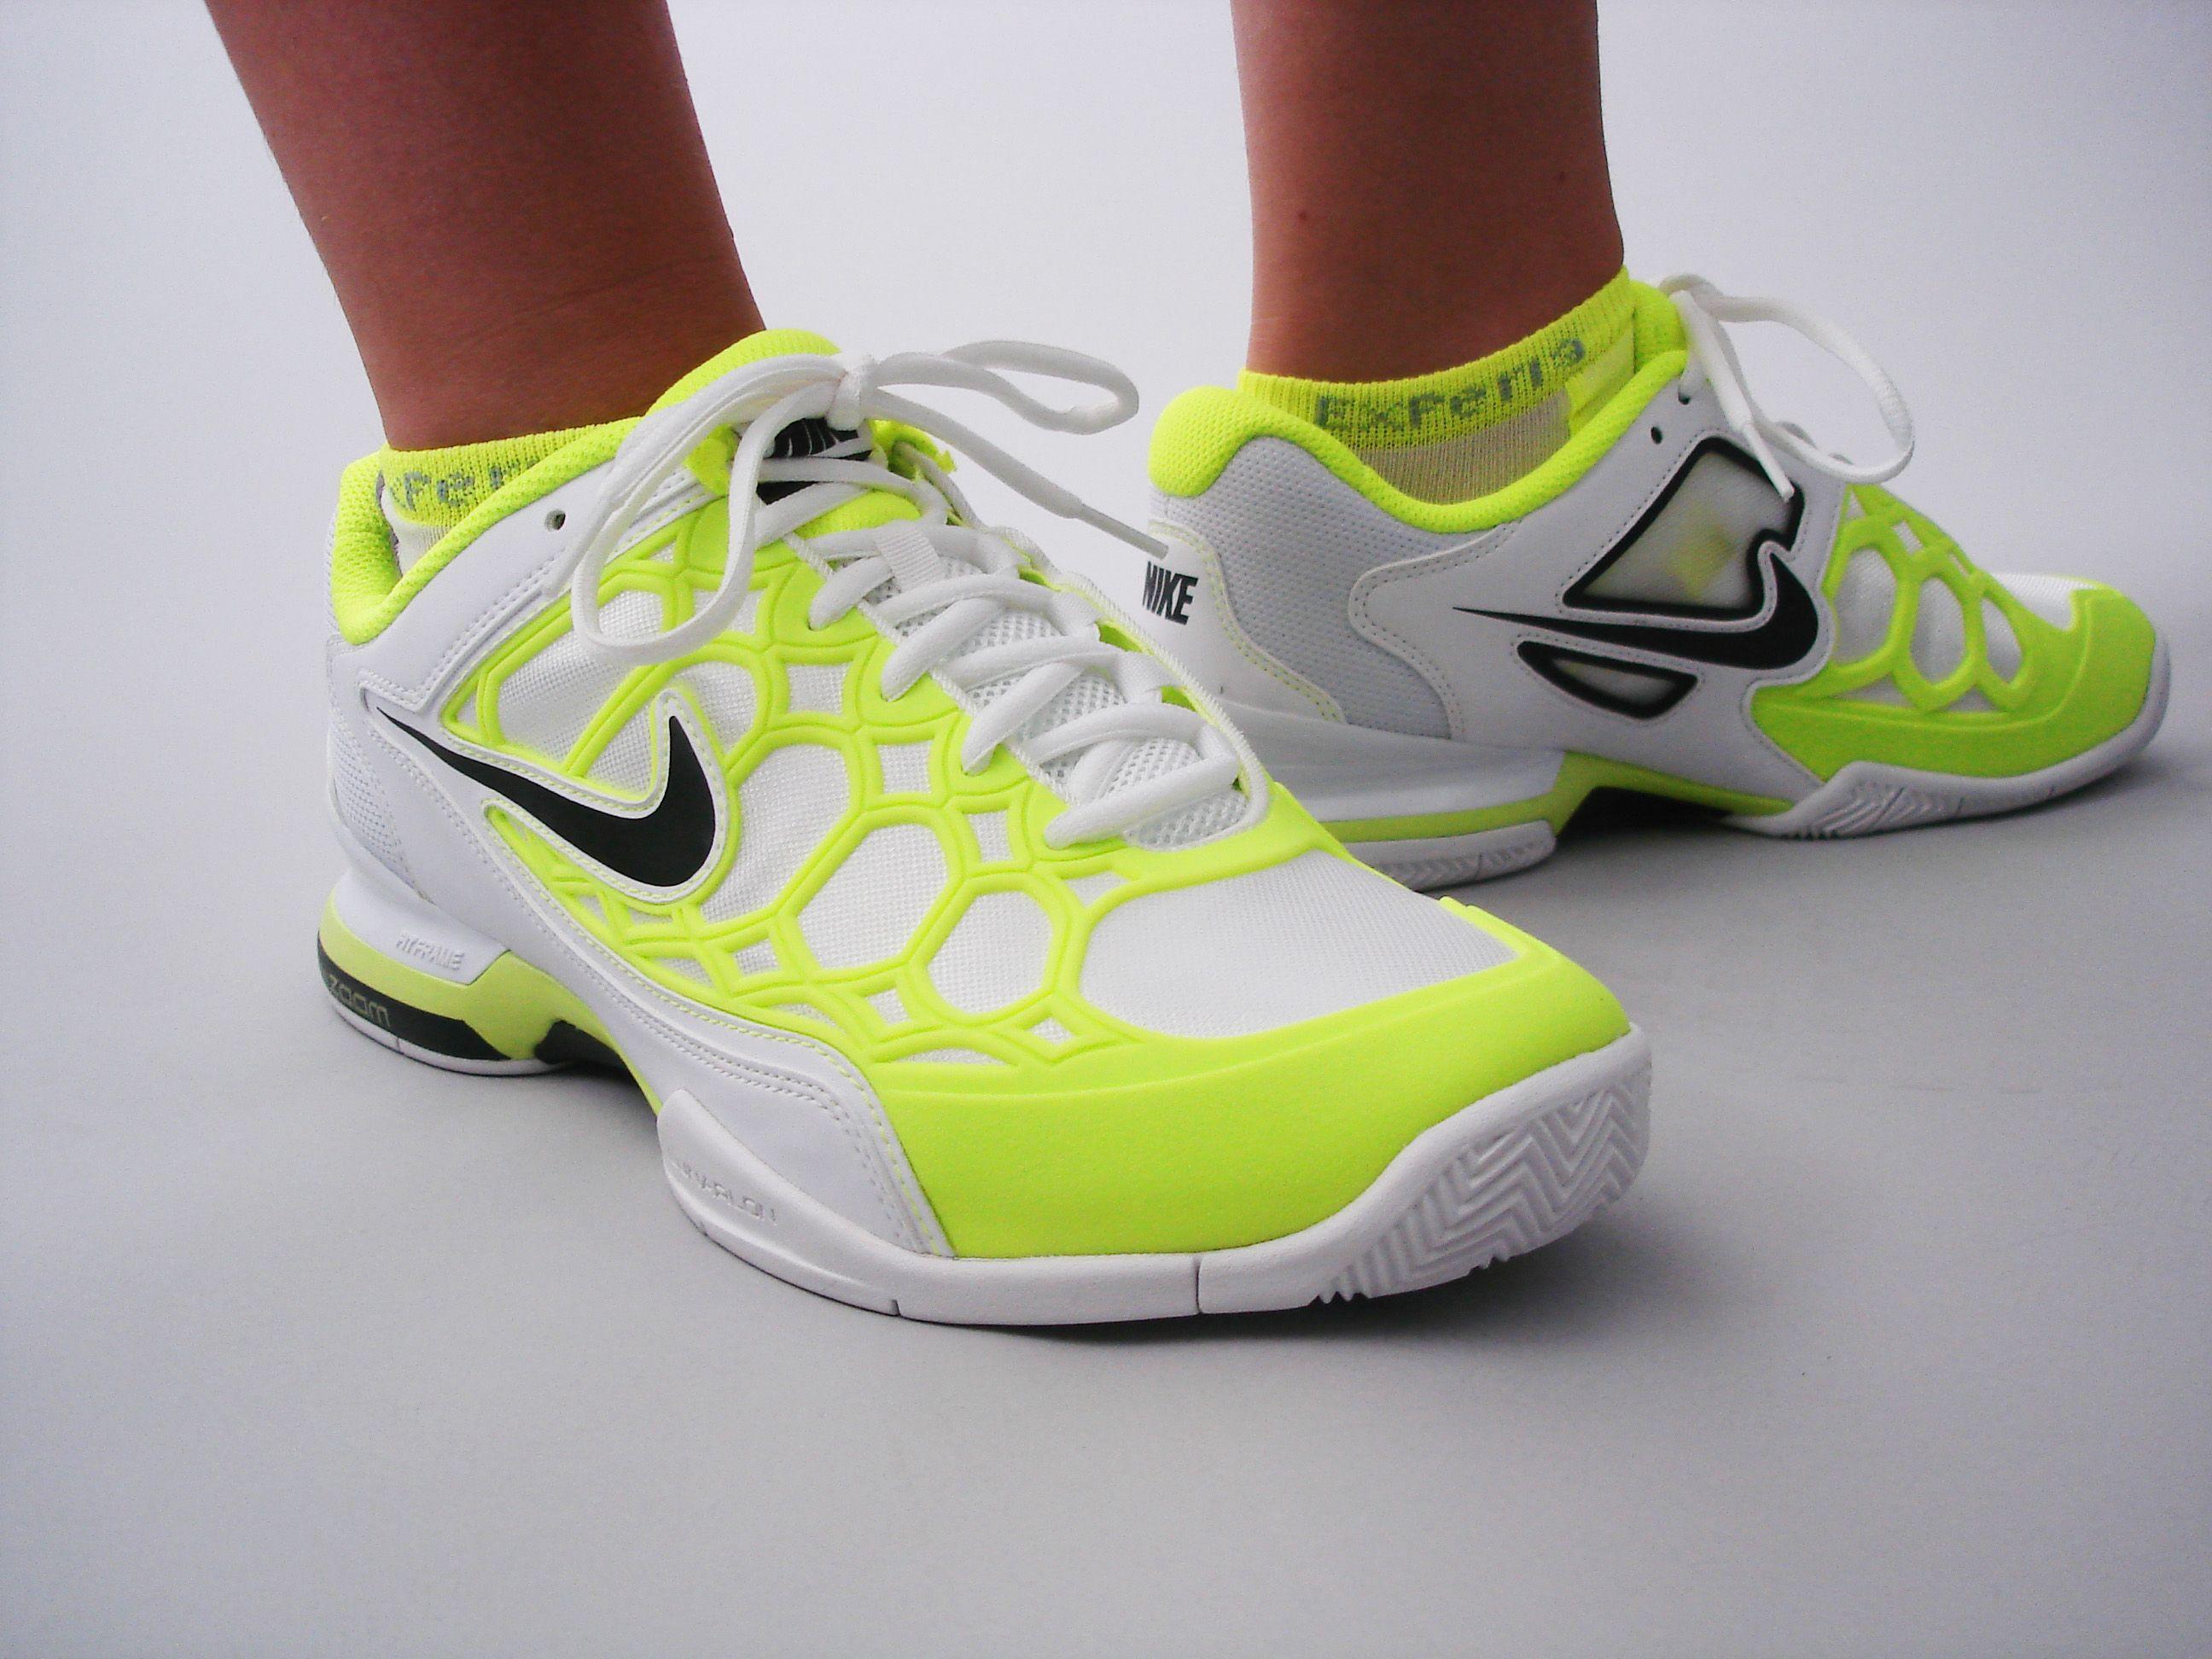 Nike Women S Tennis Shoes Women S Tennis Shoes Tennis Shoes Womens Tennis Shoes Trendy Tennis Shoes